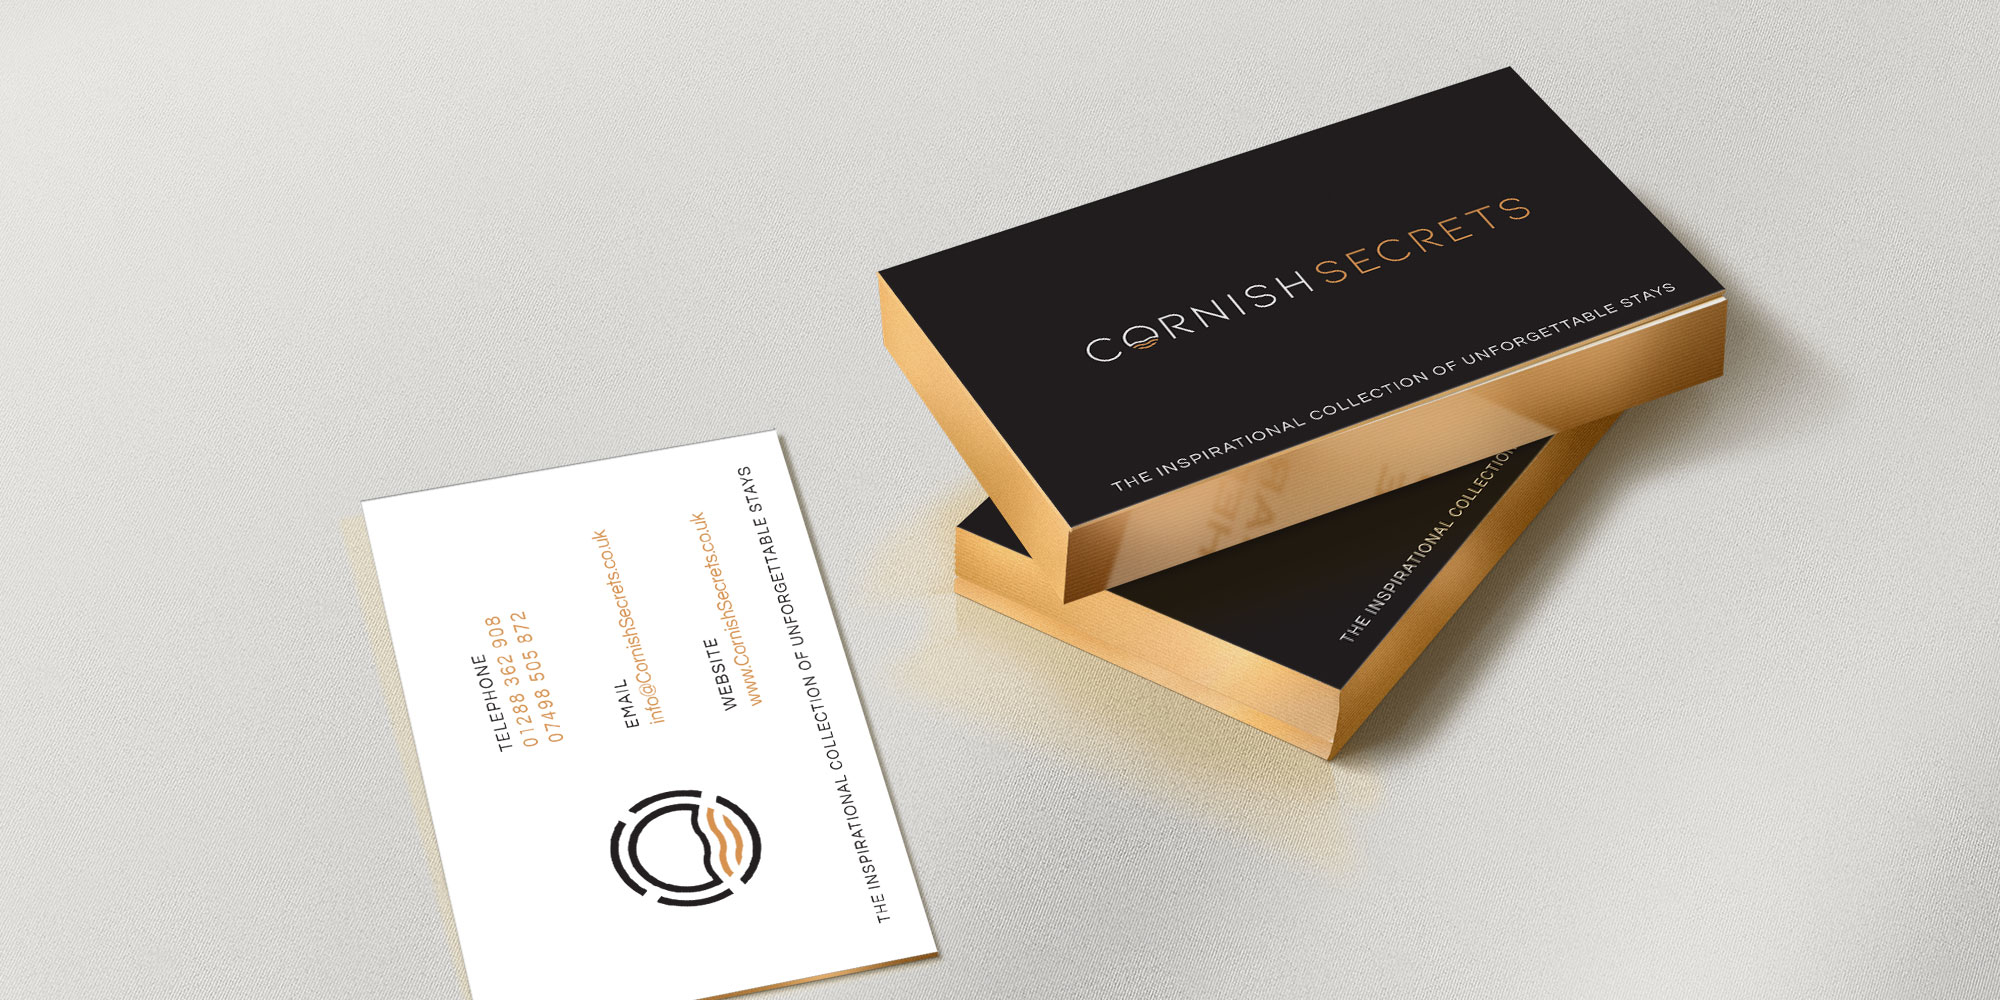 Cornish Secrets Business Card Design